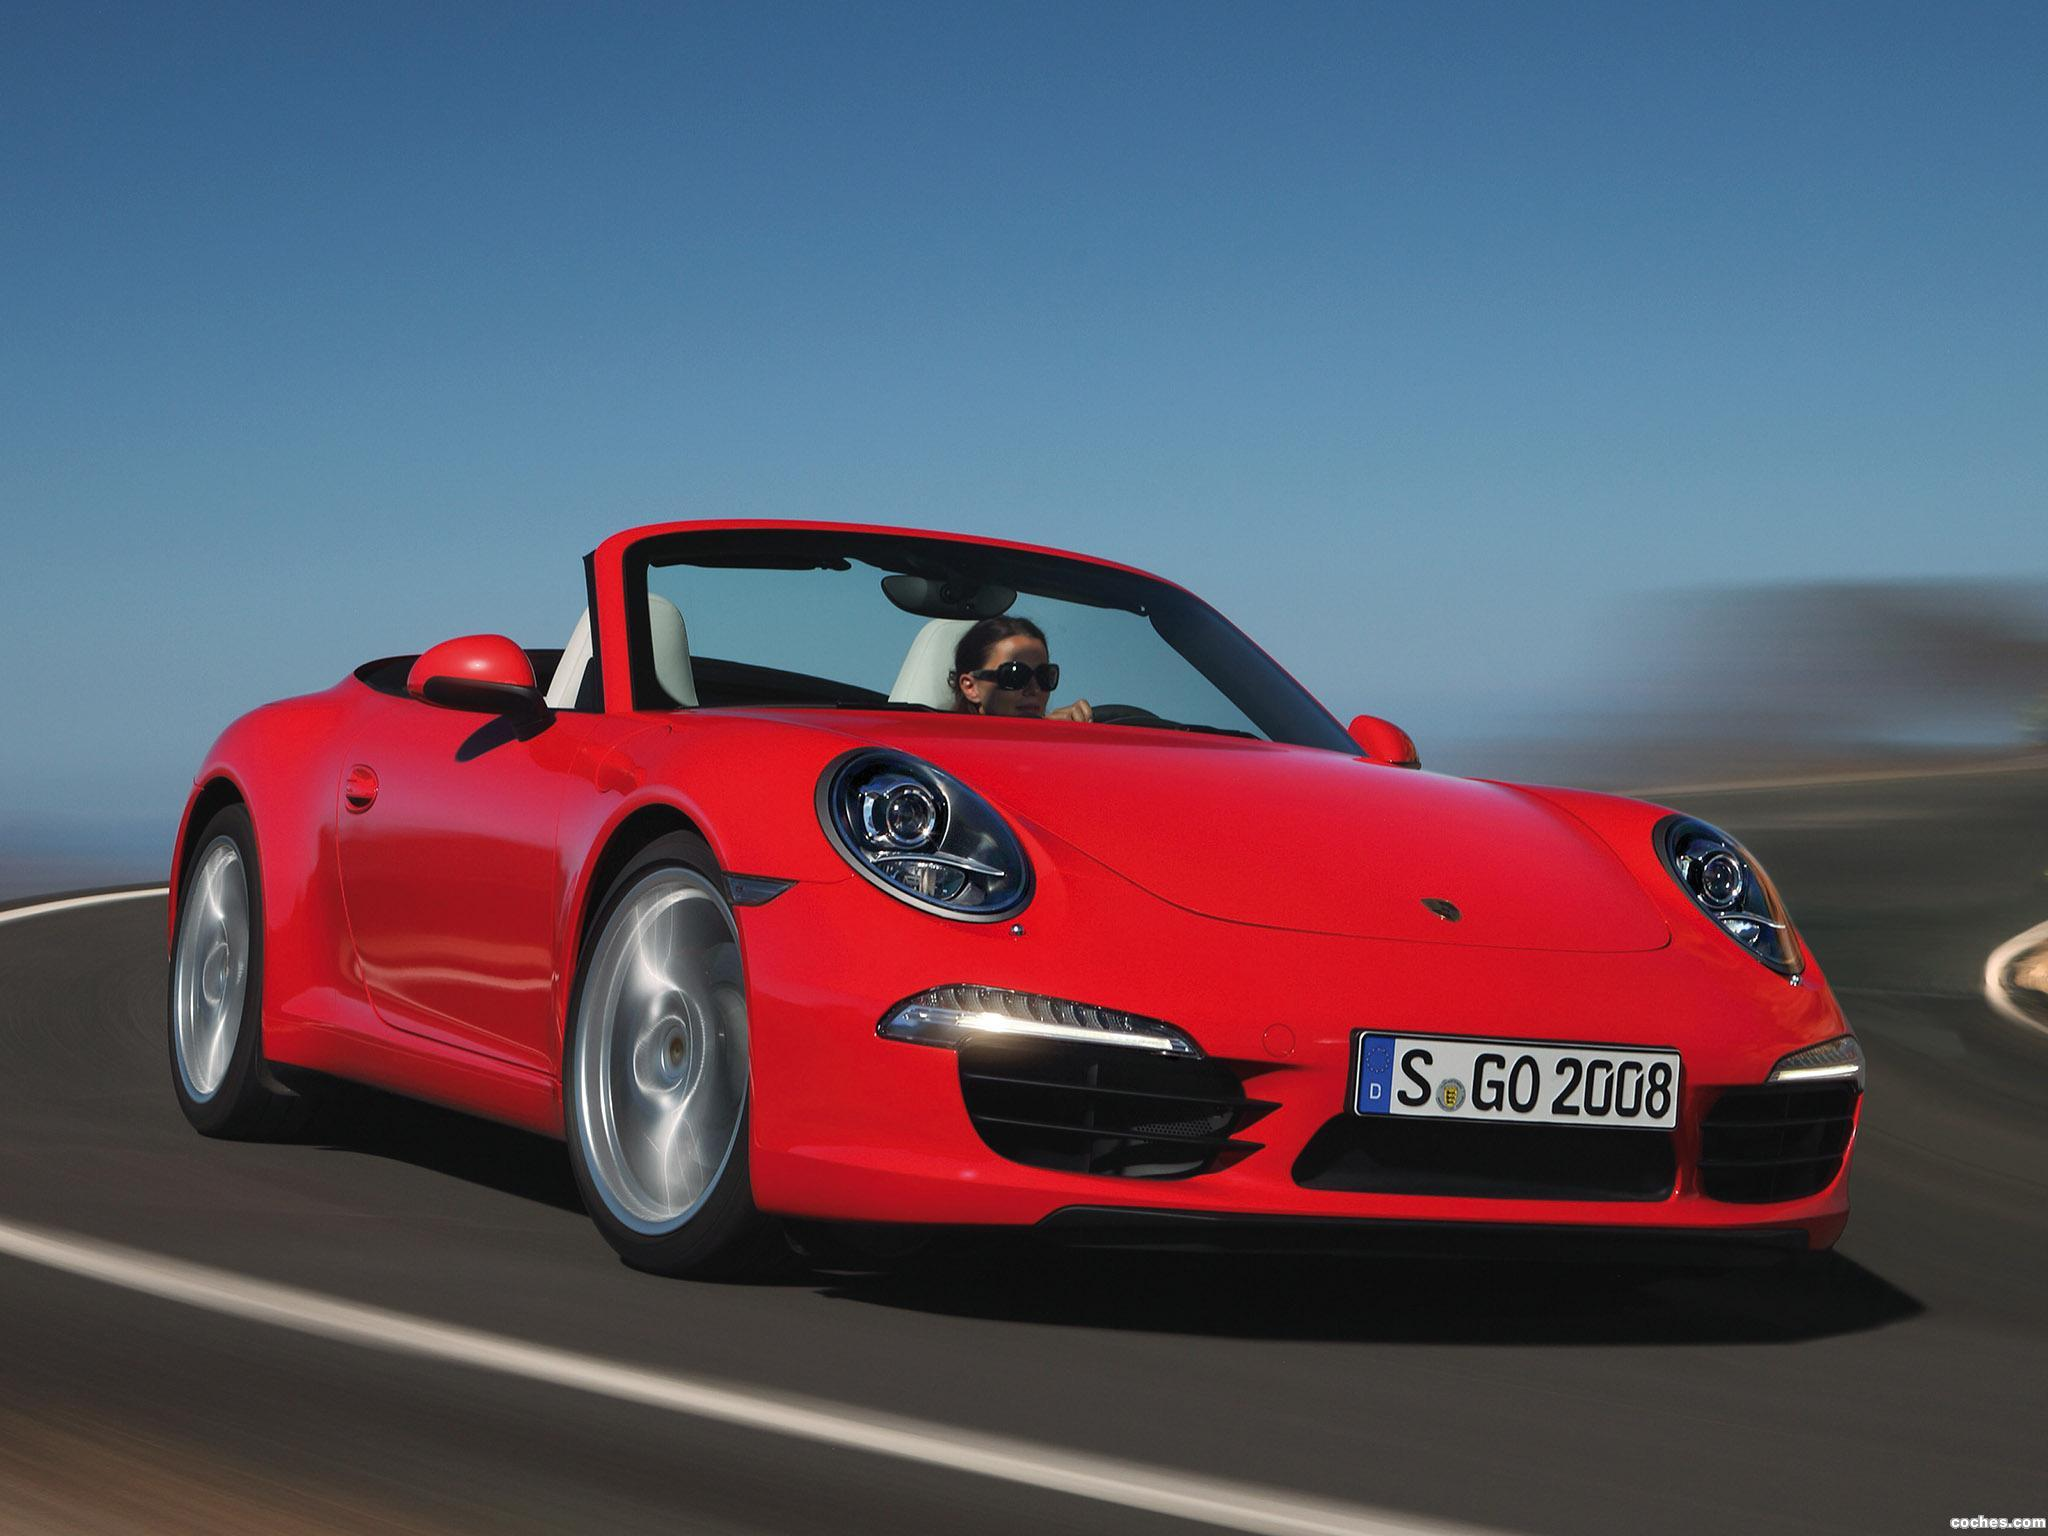 porsche_911-carrera-s-cabriolet-2012_r8.jpg